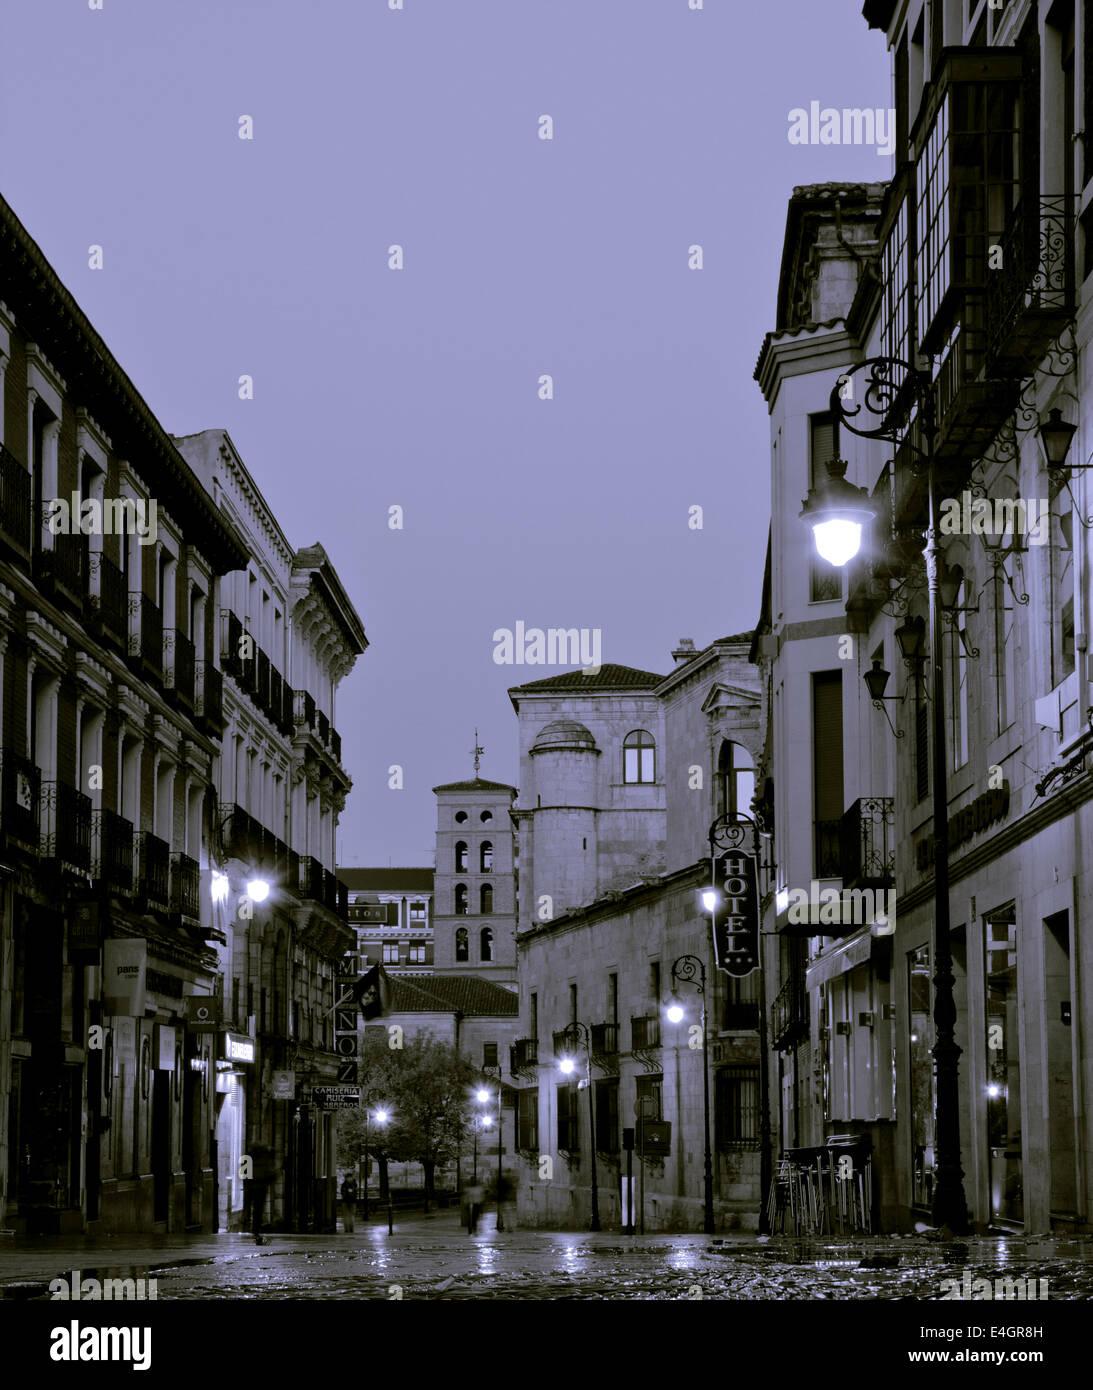 León, Spain, Great walk of St. James, Jakobsweg, Camino de Santiago, Morning hours, Black and white - Stock Image